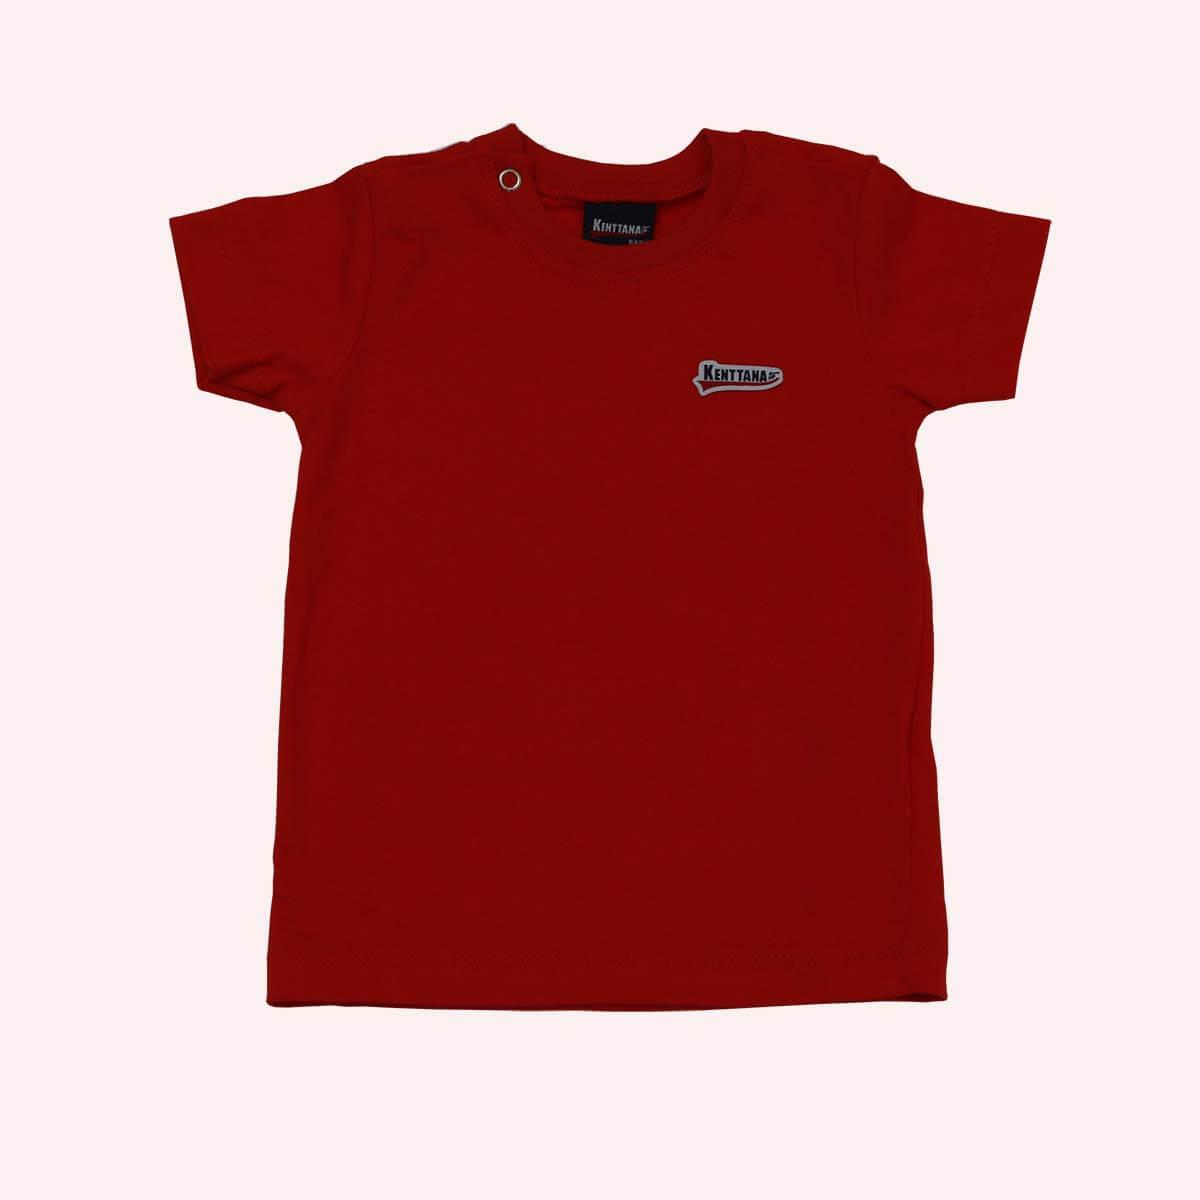 Camiseta Kenttana Vermelha Baby